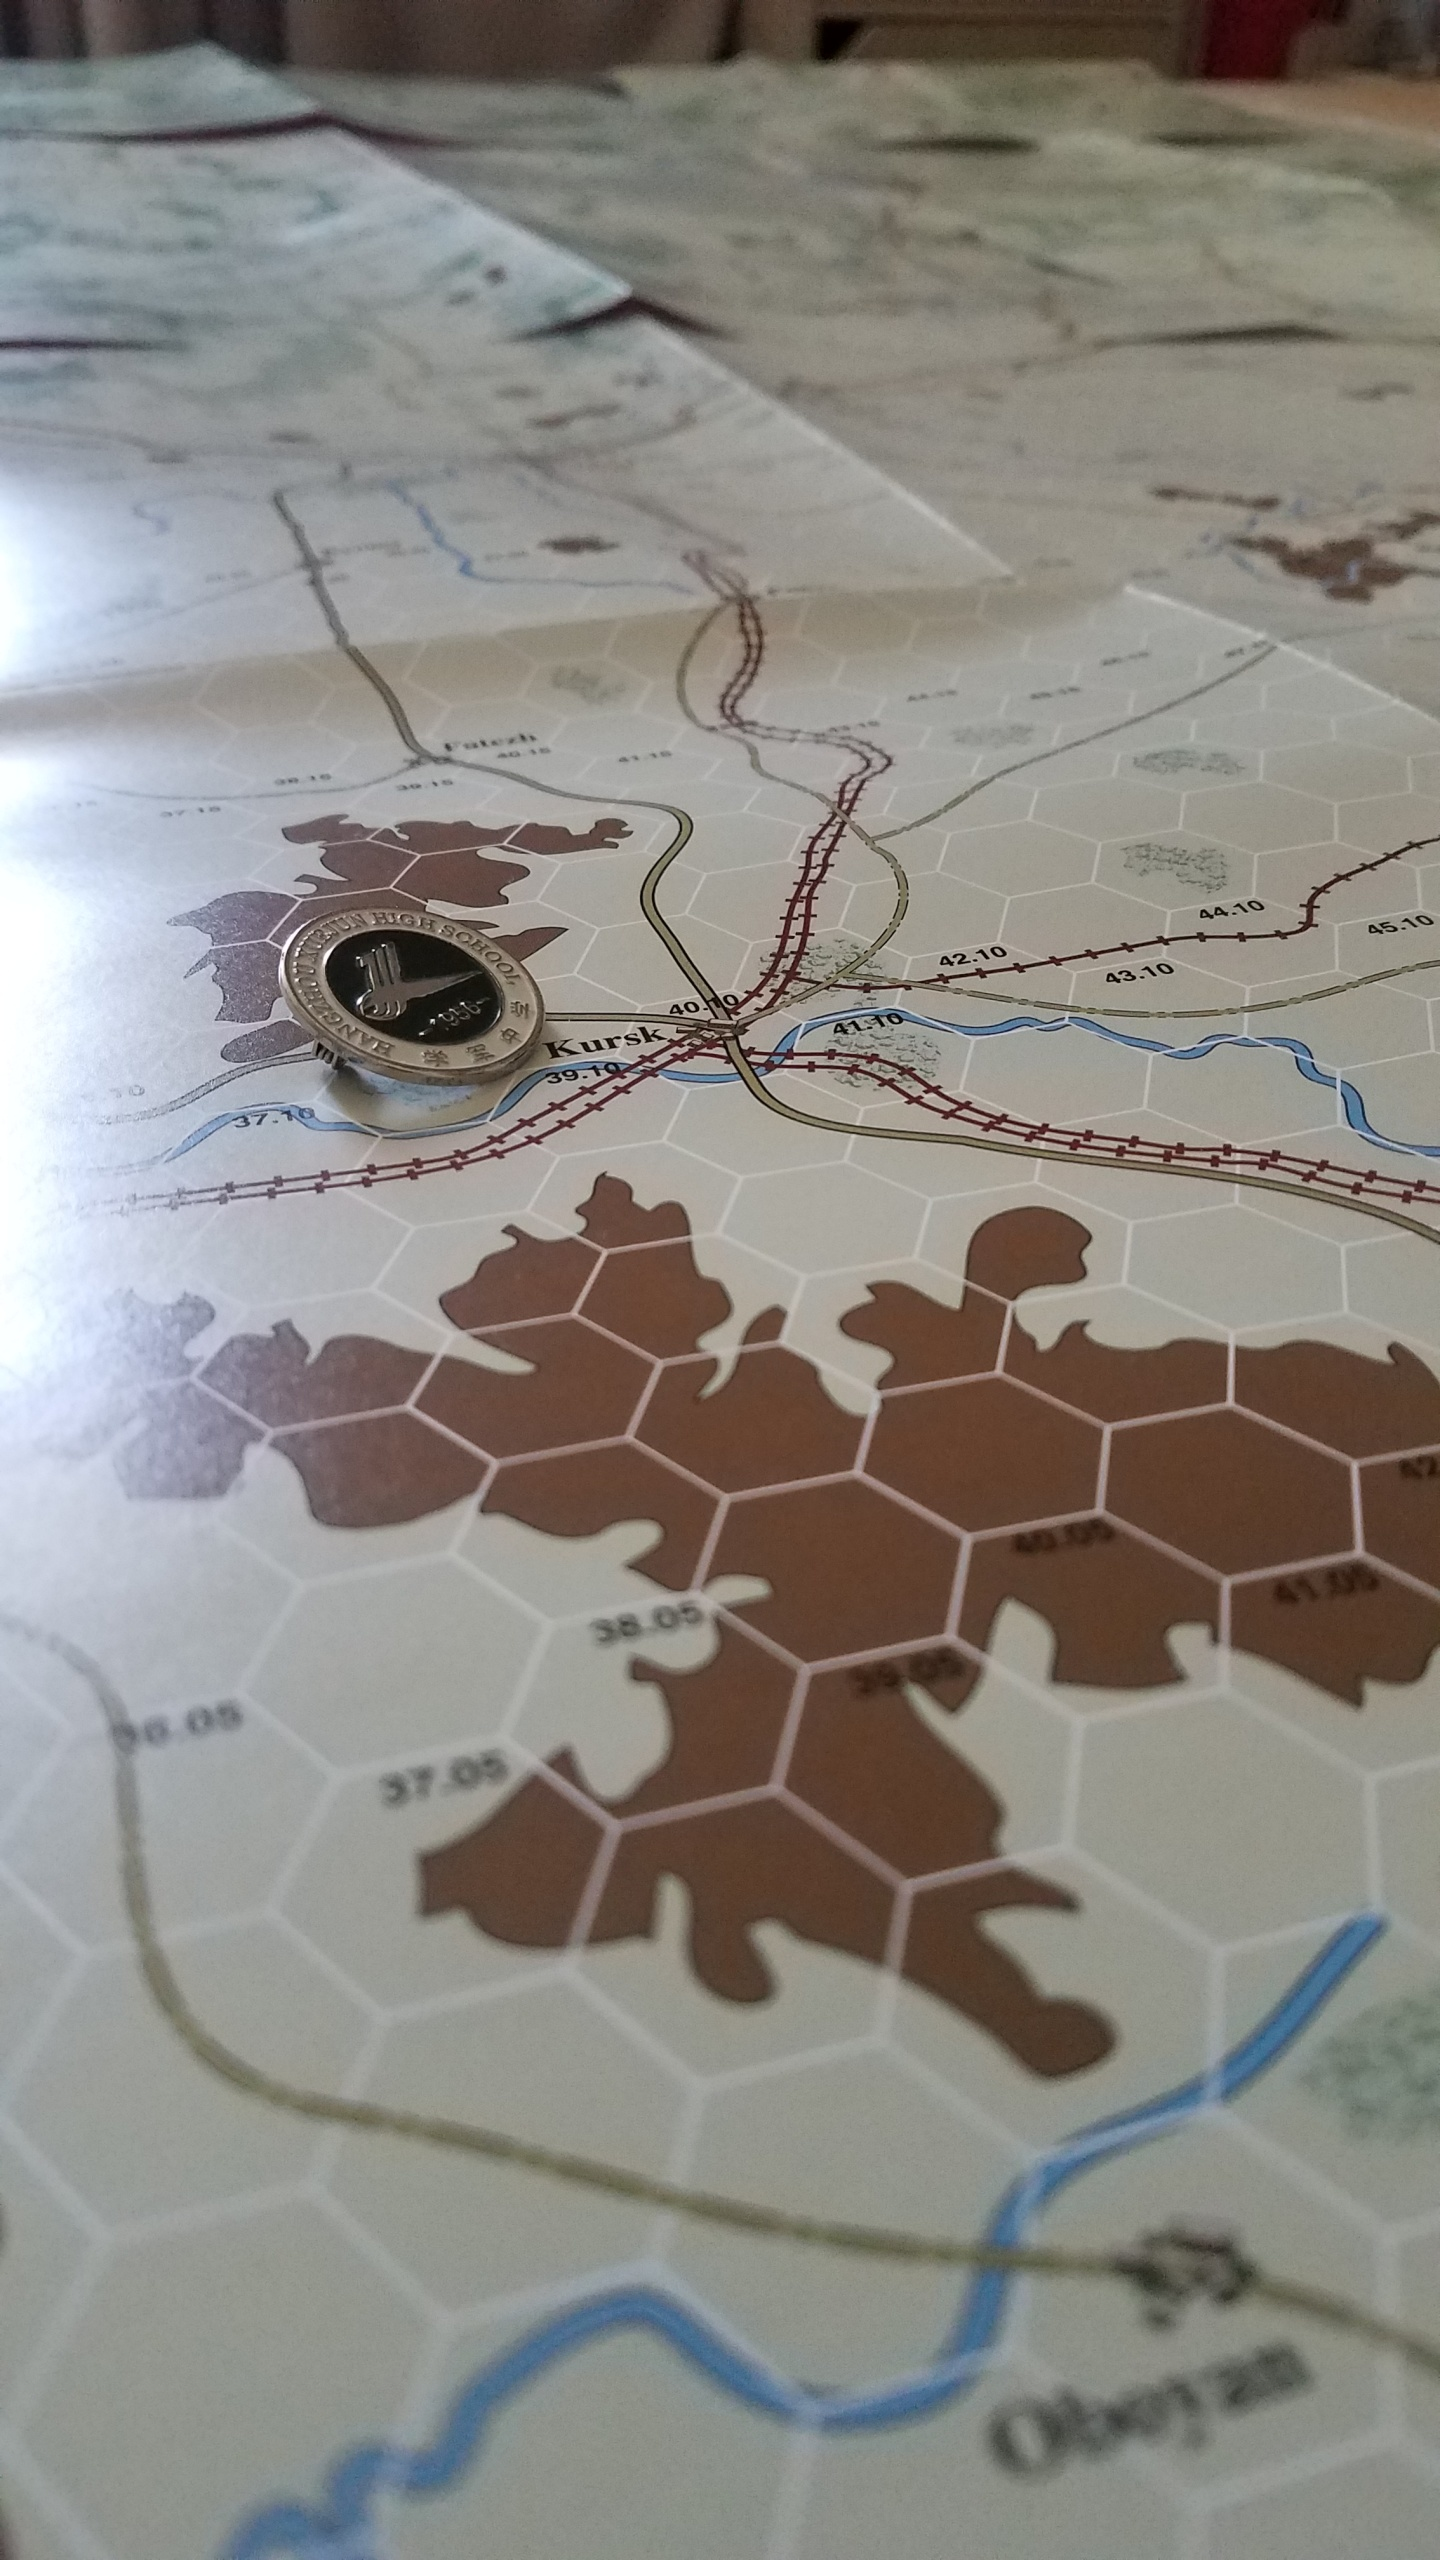 兵棋开箱 Guderian's Blitzkrieg II